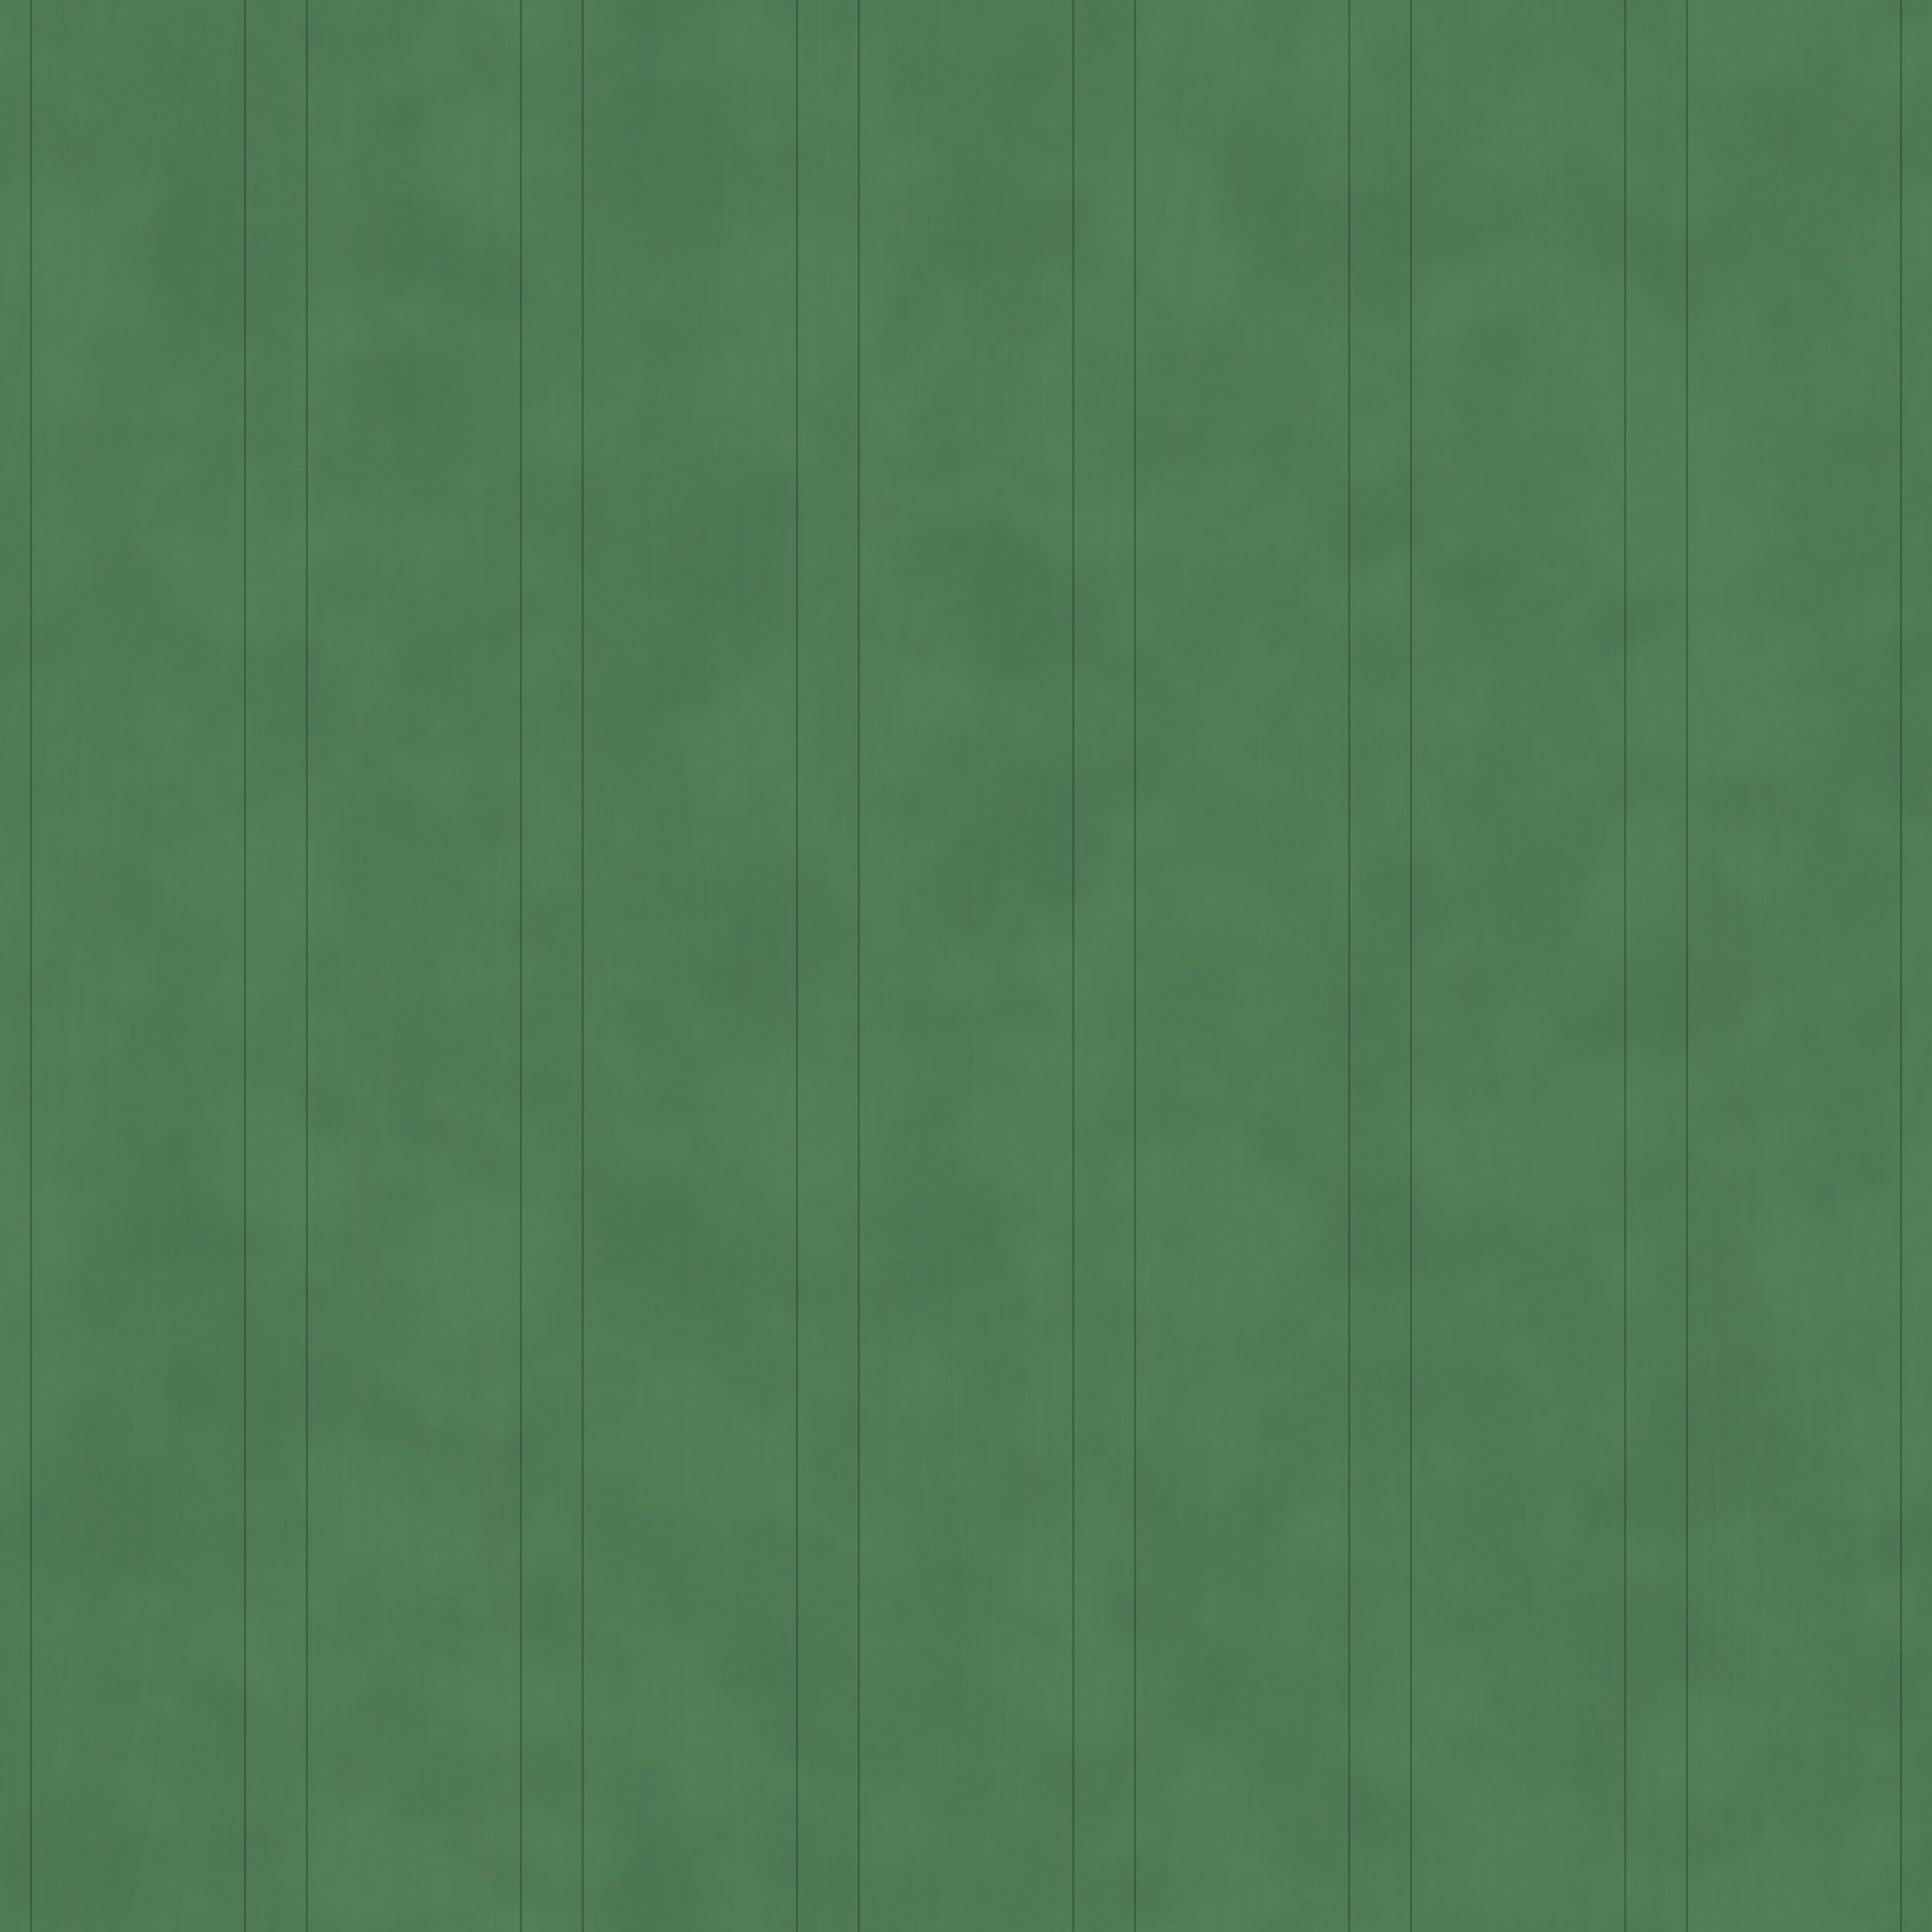 Siding_AI_01B_Green_COLOR.jpg